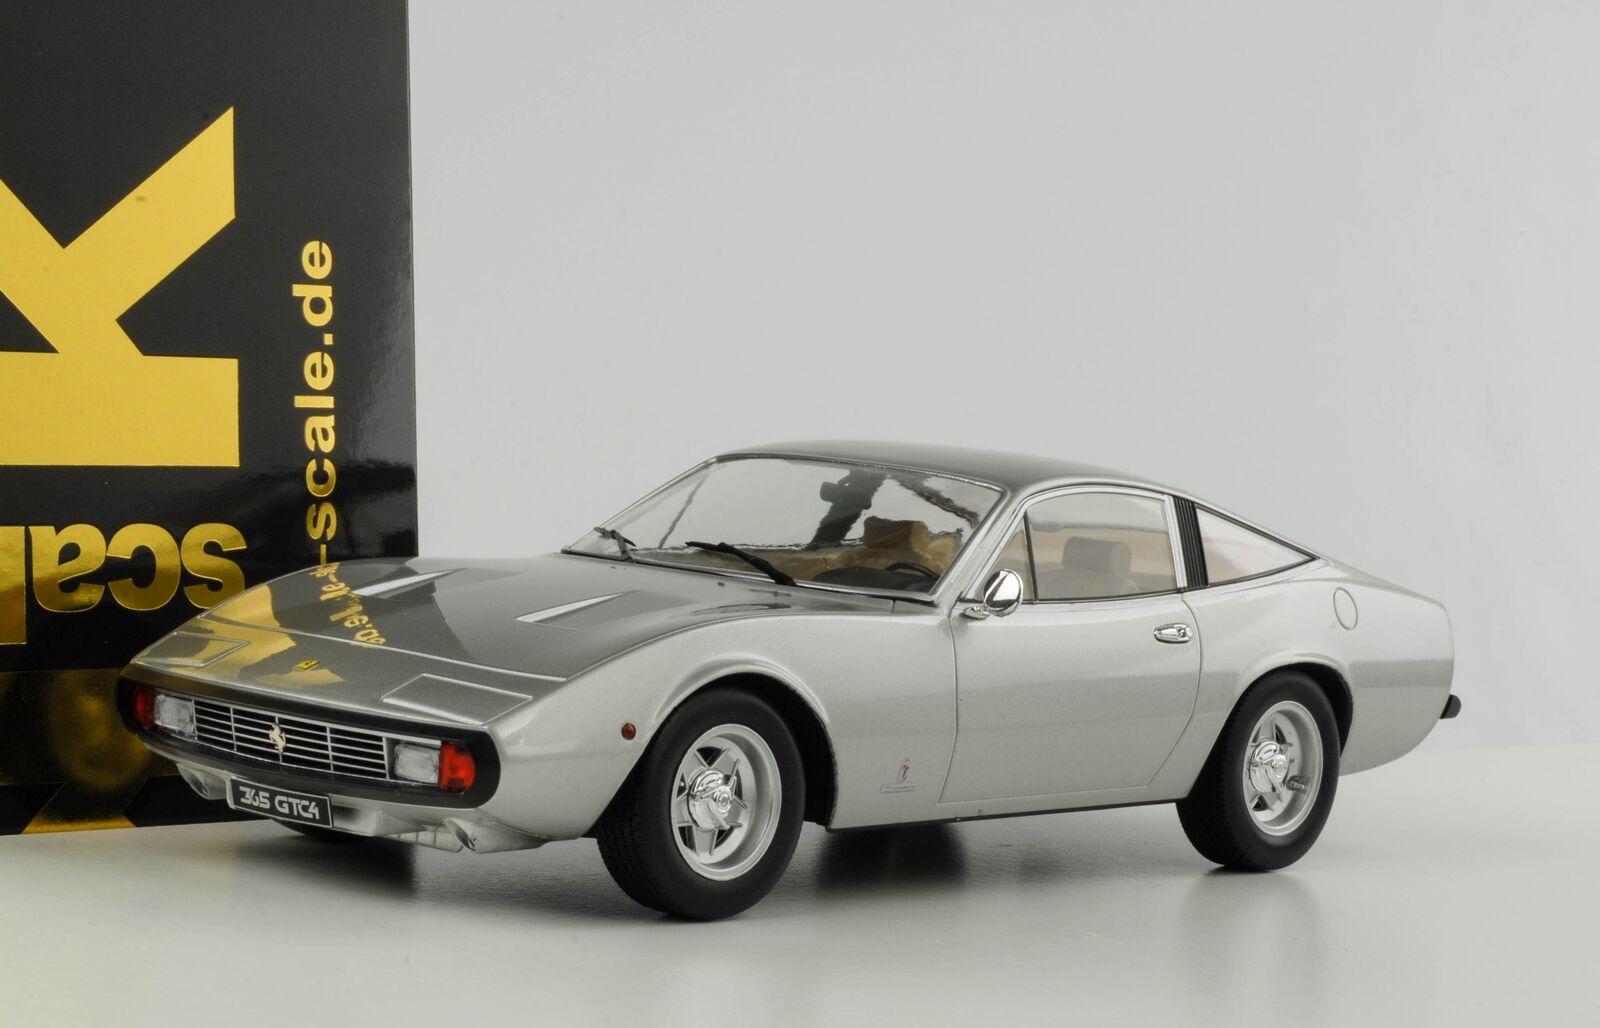 Ferrari 365 GTC 4 Coupe  - Il Gobbone - - - 1971 silber  1 18 KK diecast 11102a